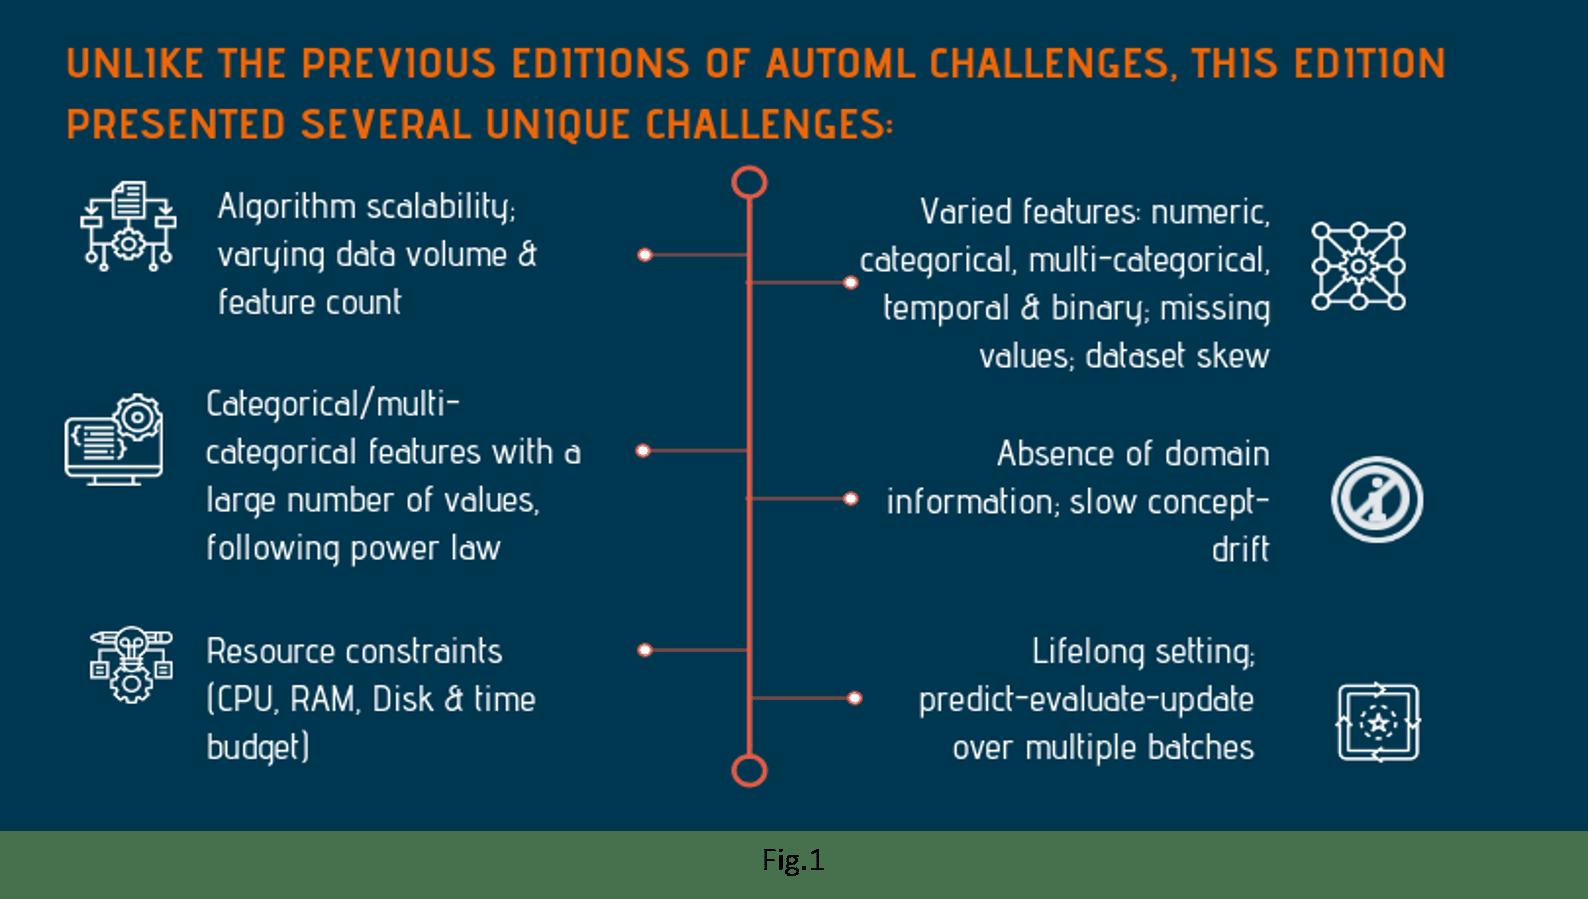 Lifelong machine learning AutoML challenge AI that creates AI